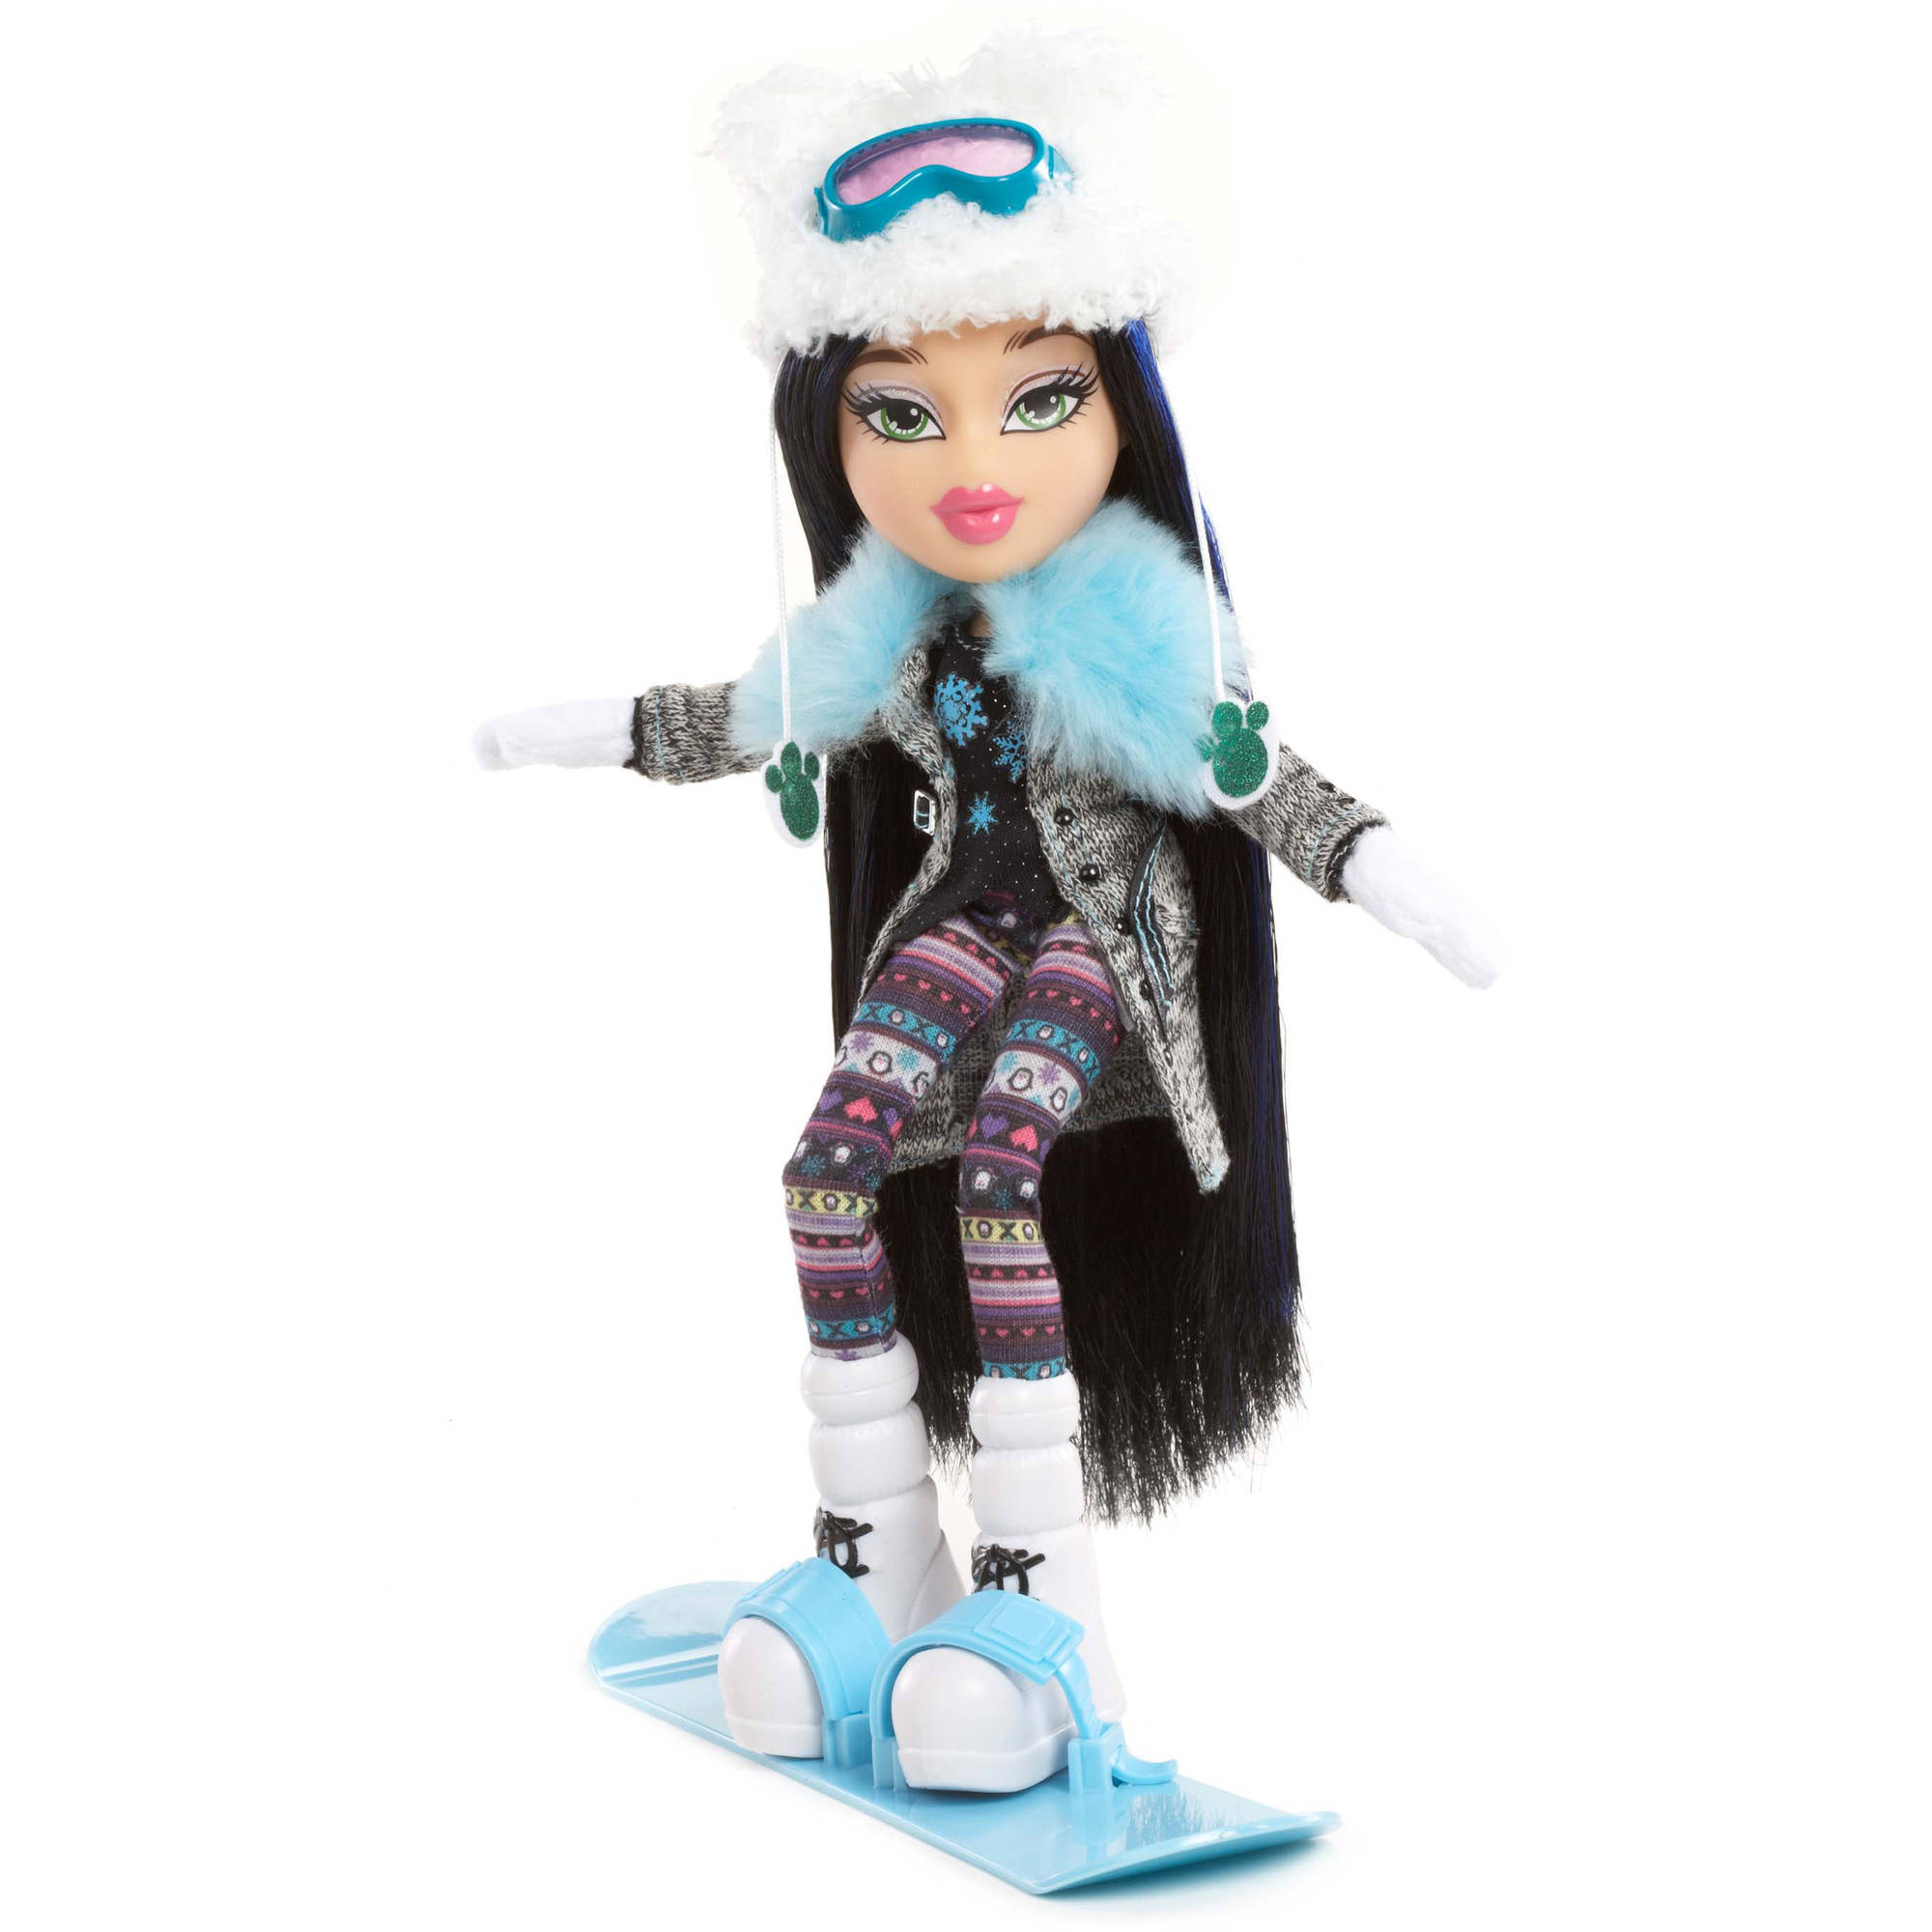 Bratz SnowKissed Doll, Jade by MGA Entertainment